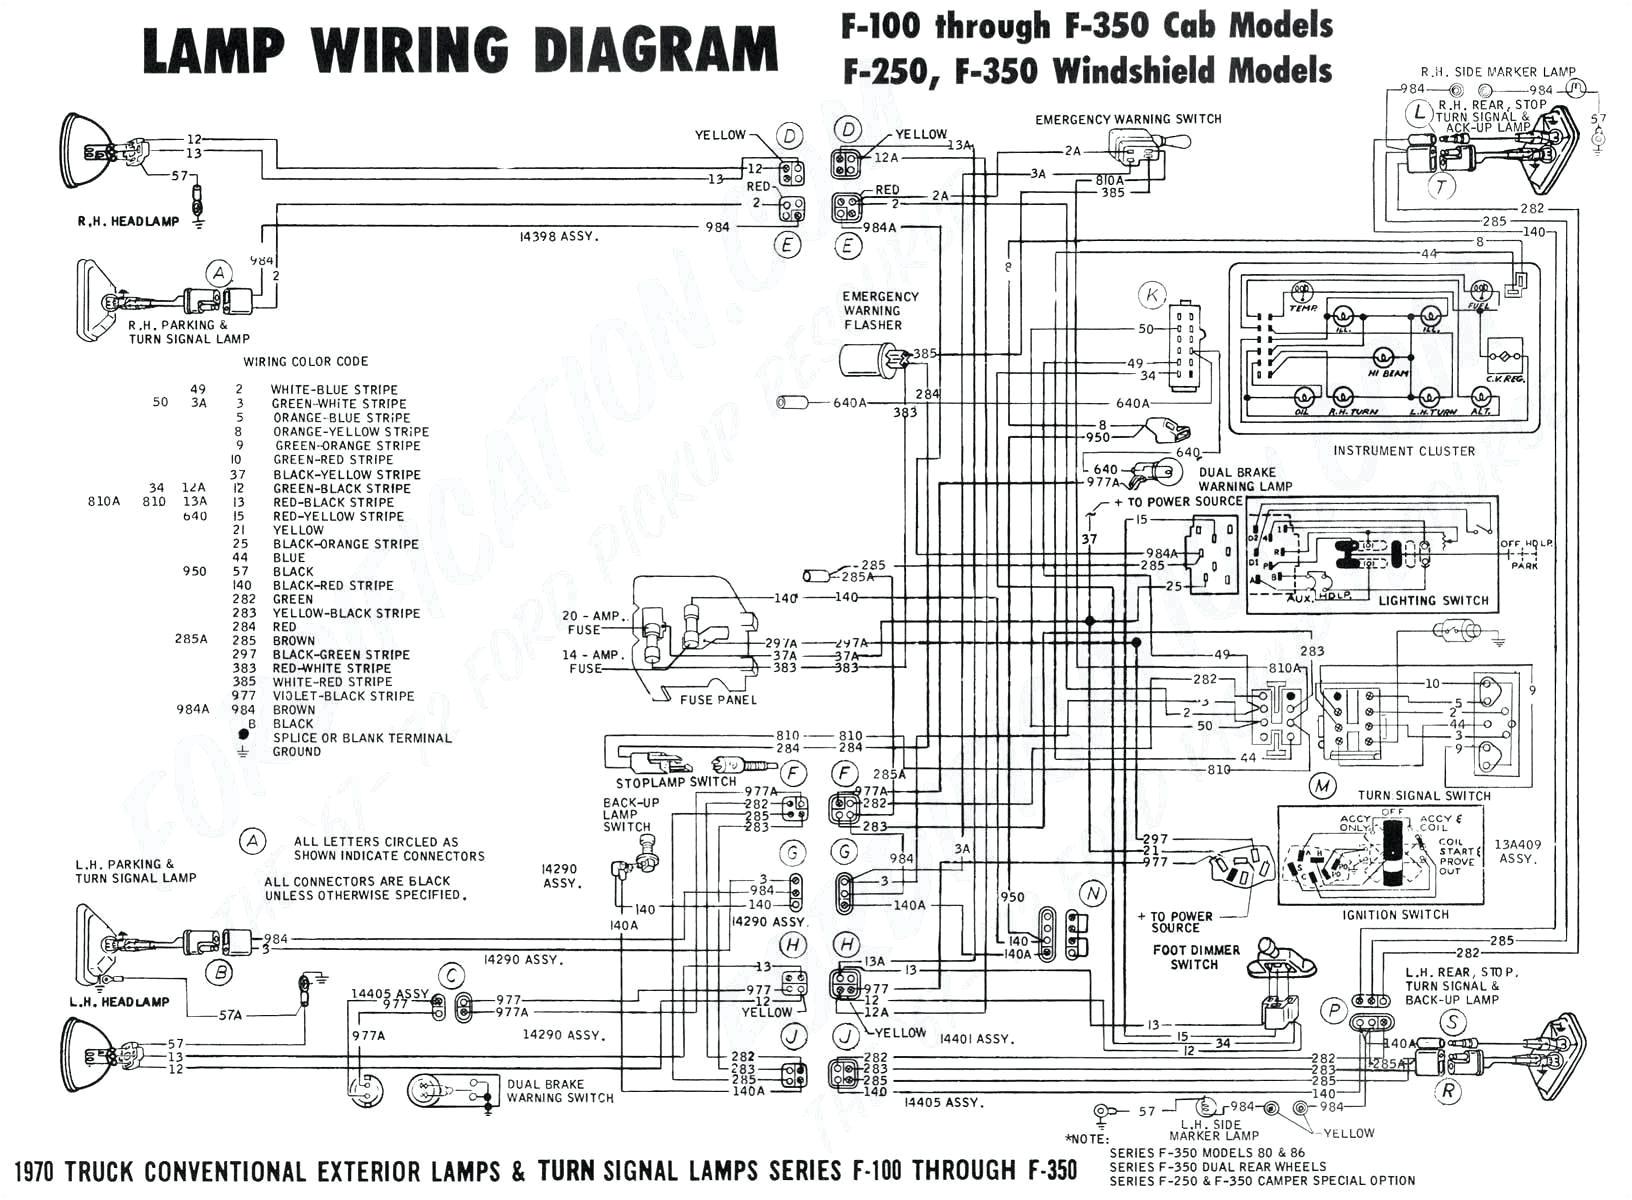 Kim Hotstart Wiring Diagrams Skf Wiring Diagram Schematic Diagrams